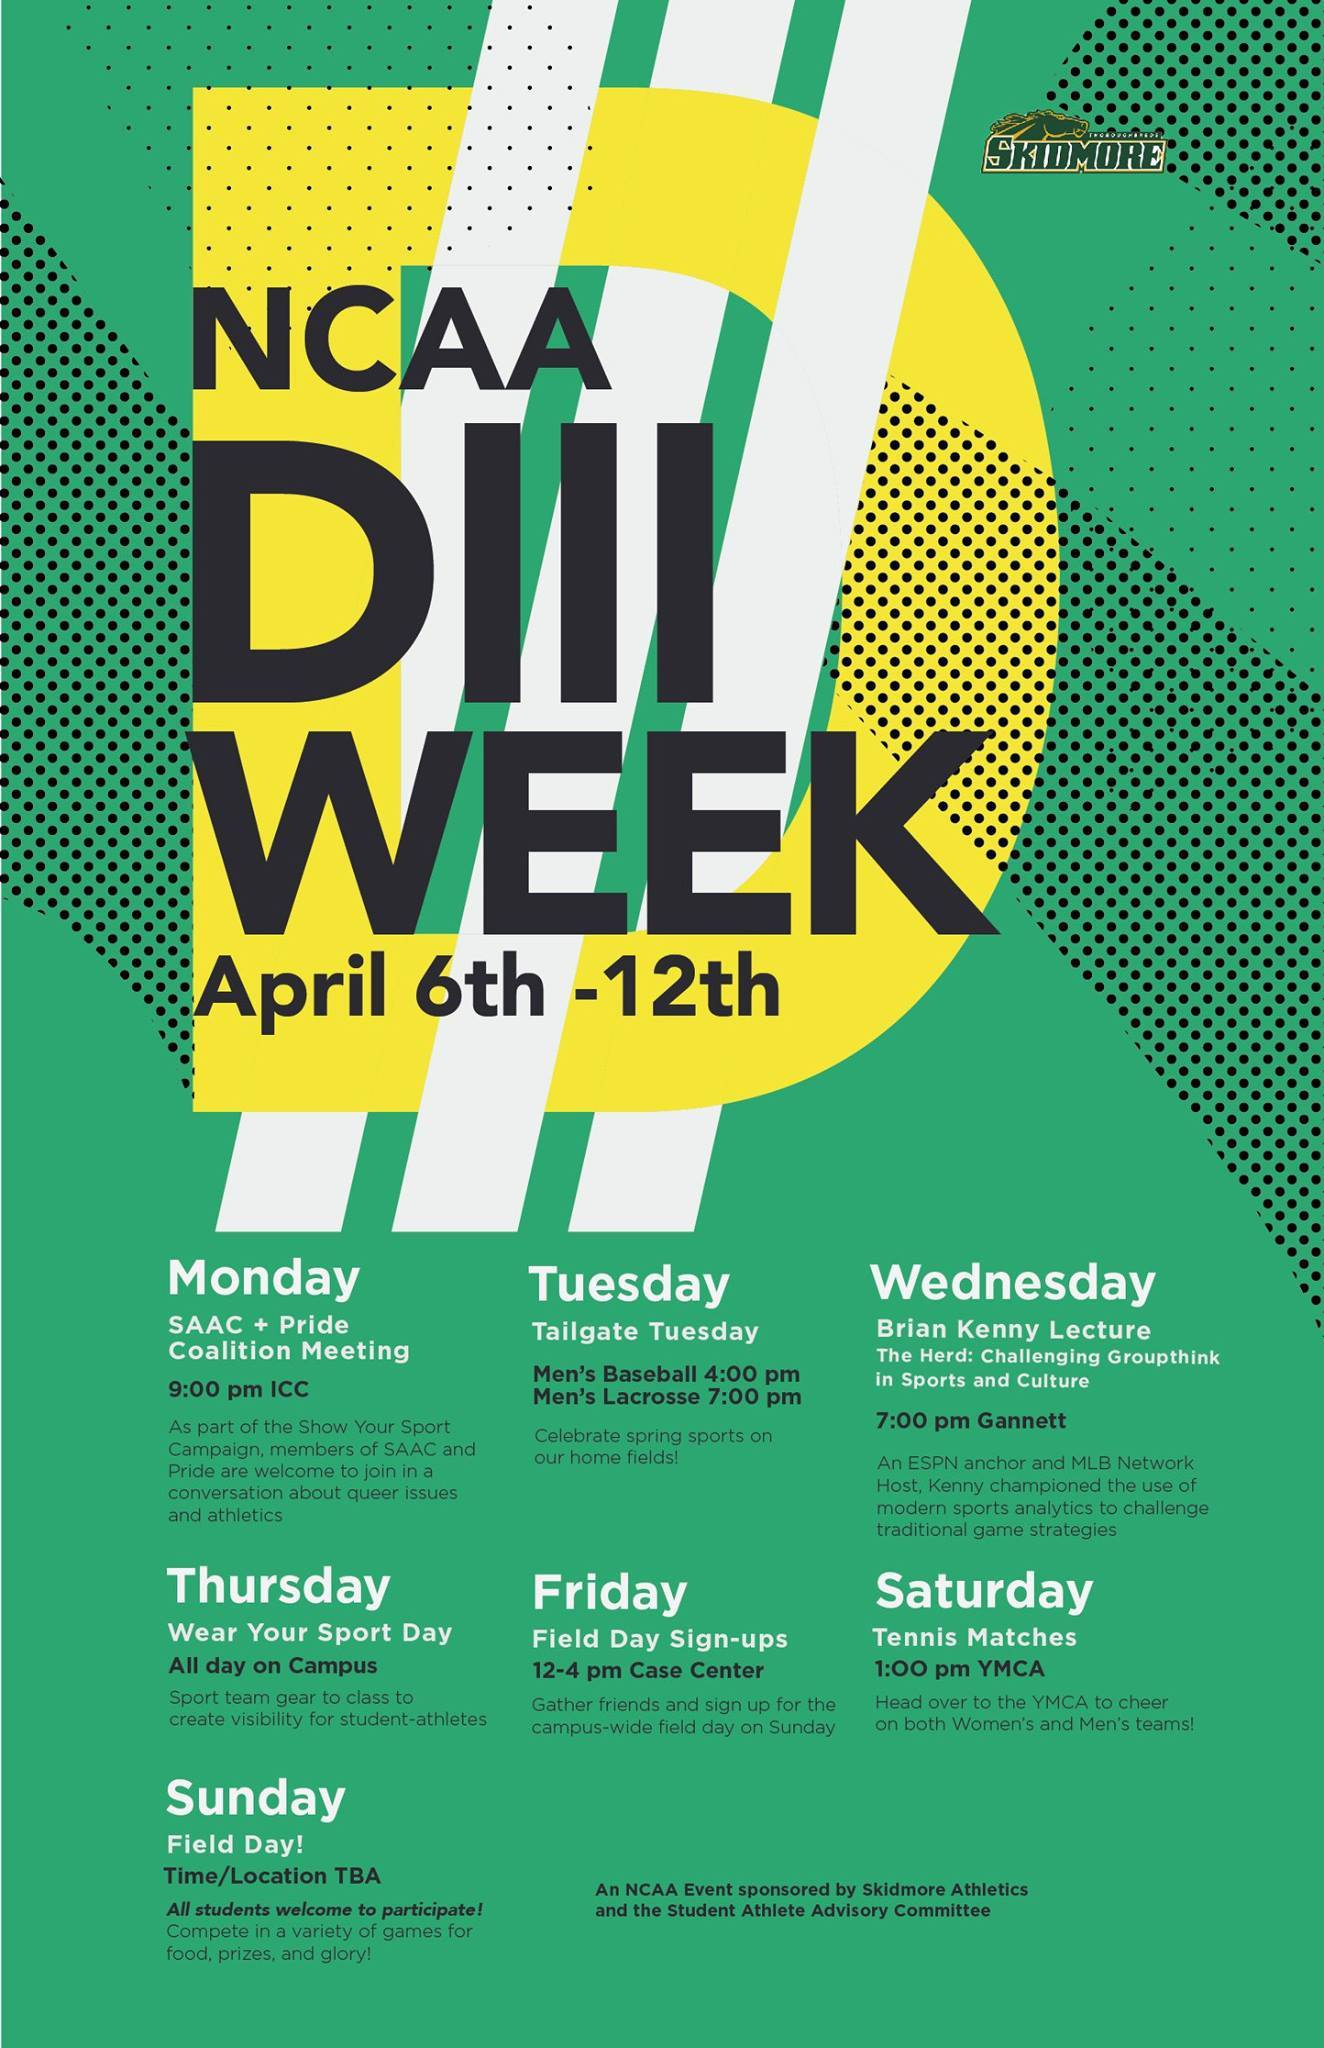 DIII Week Poster, by Aria Goodman '15